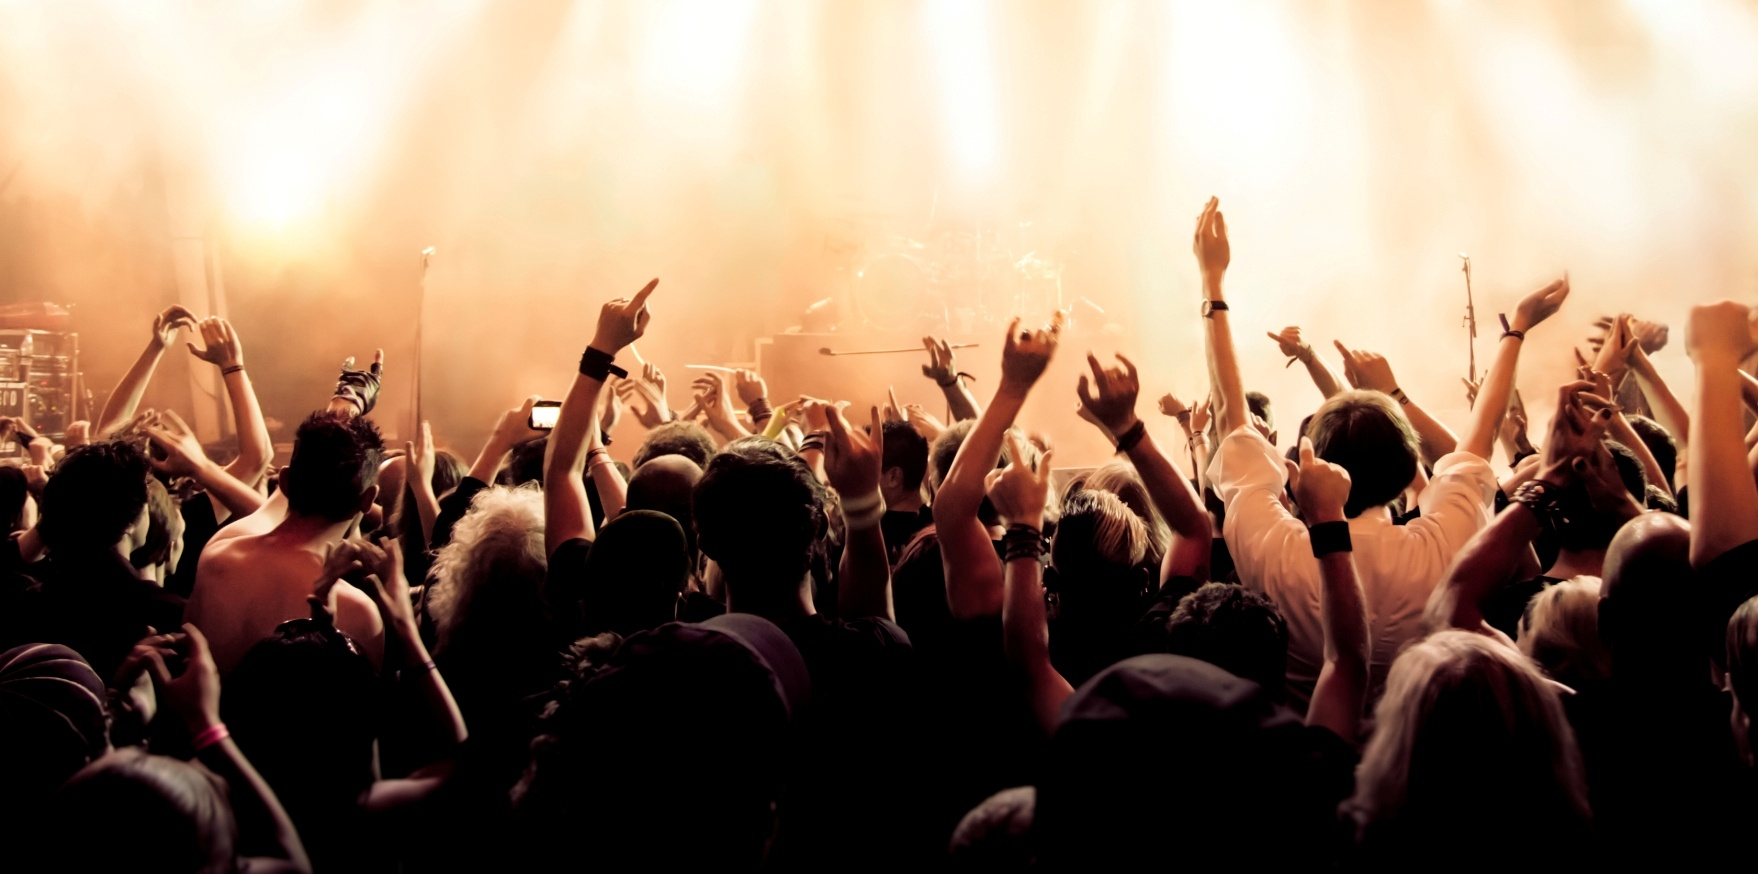 crowd-004.jpg